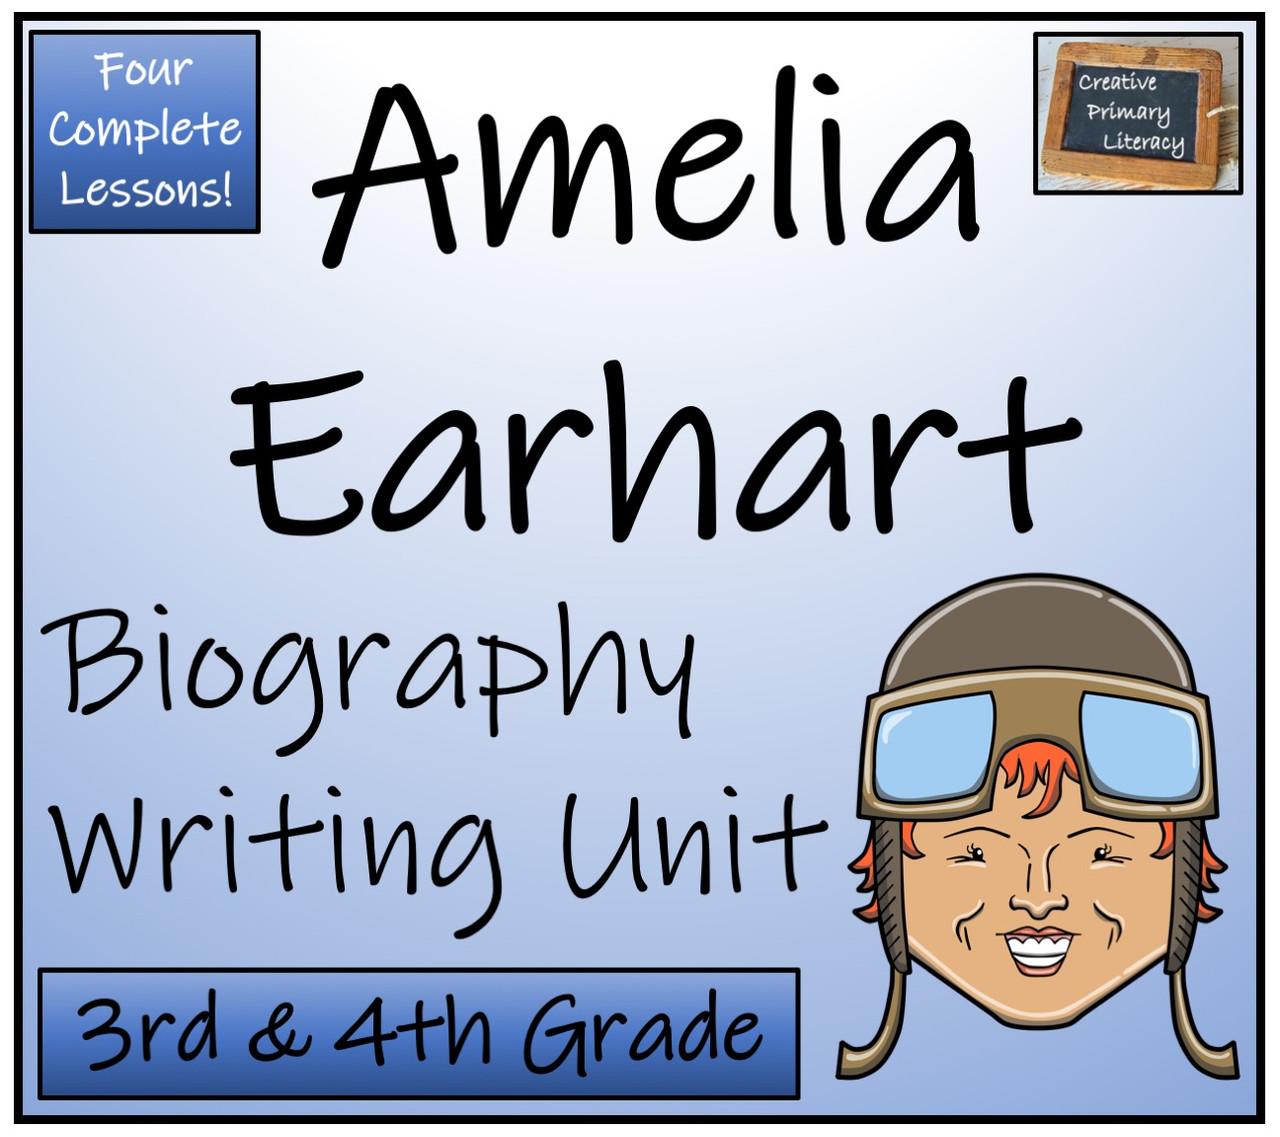 Amelia Earhart - 3rd & 4th Grade Biography Writing Activity